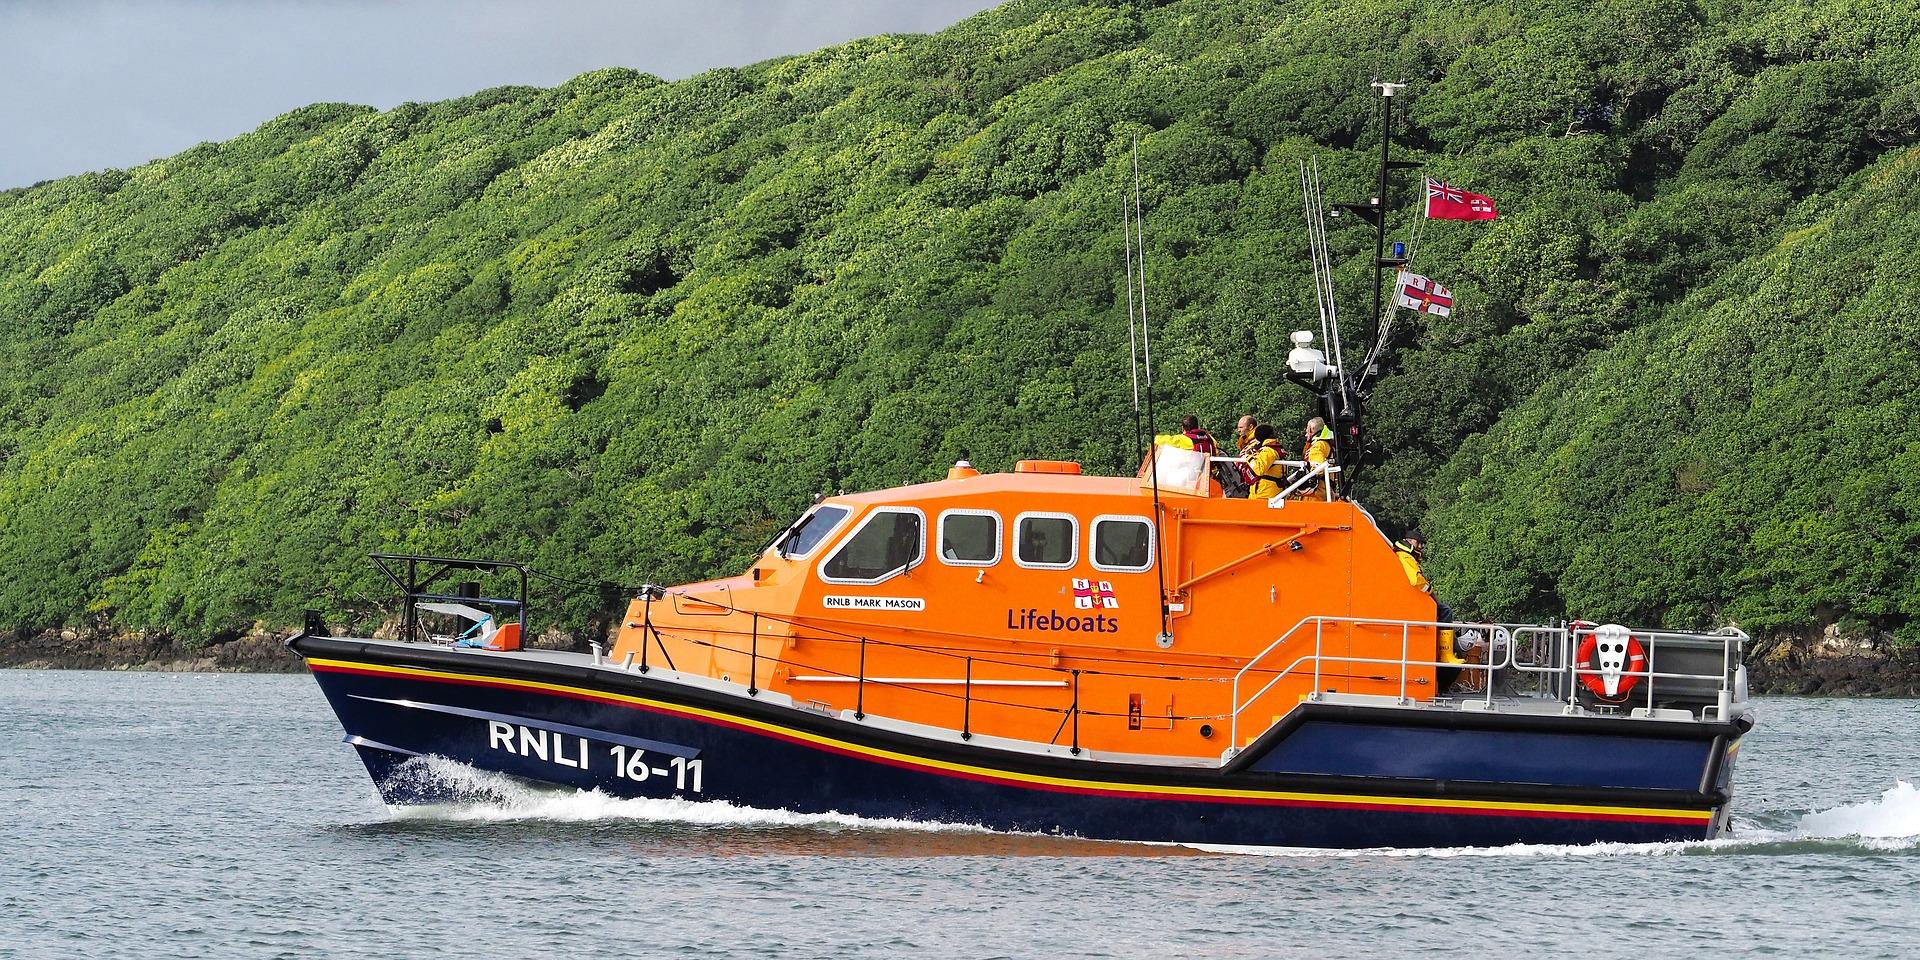 RNLI lifeboat cornwall